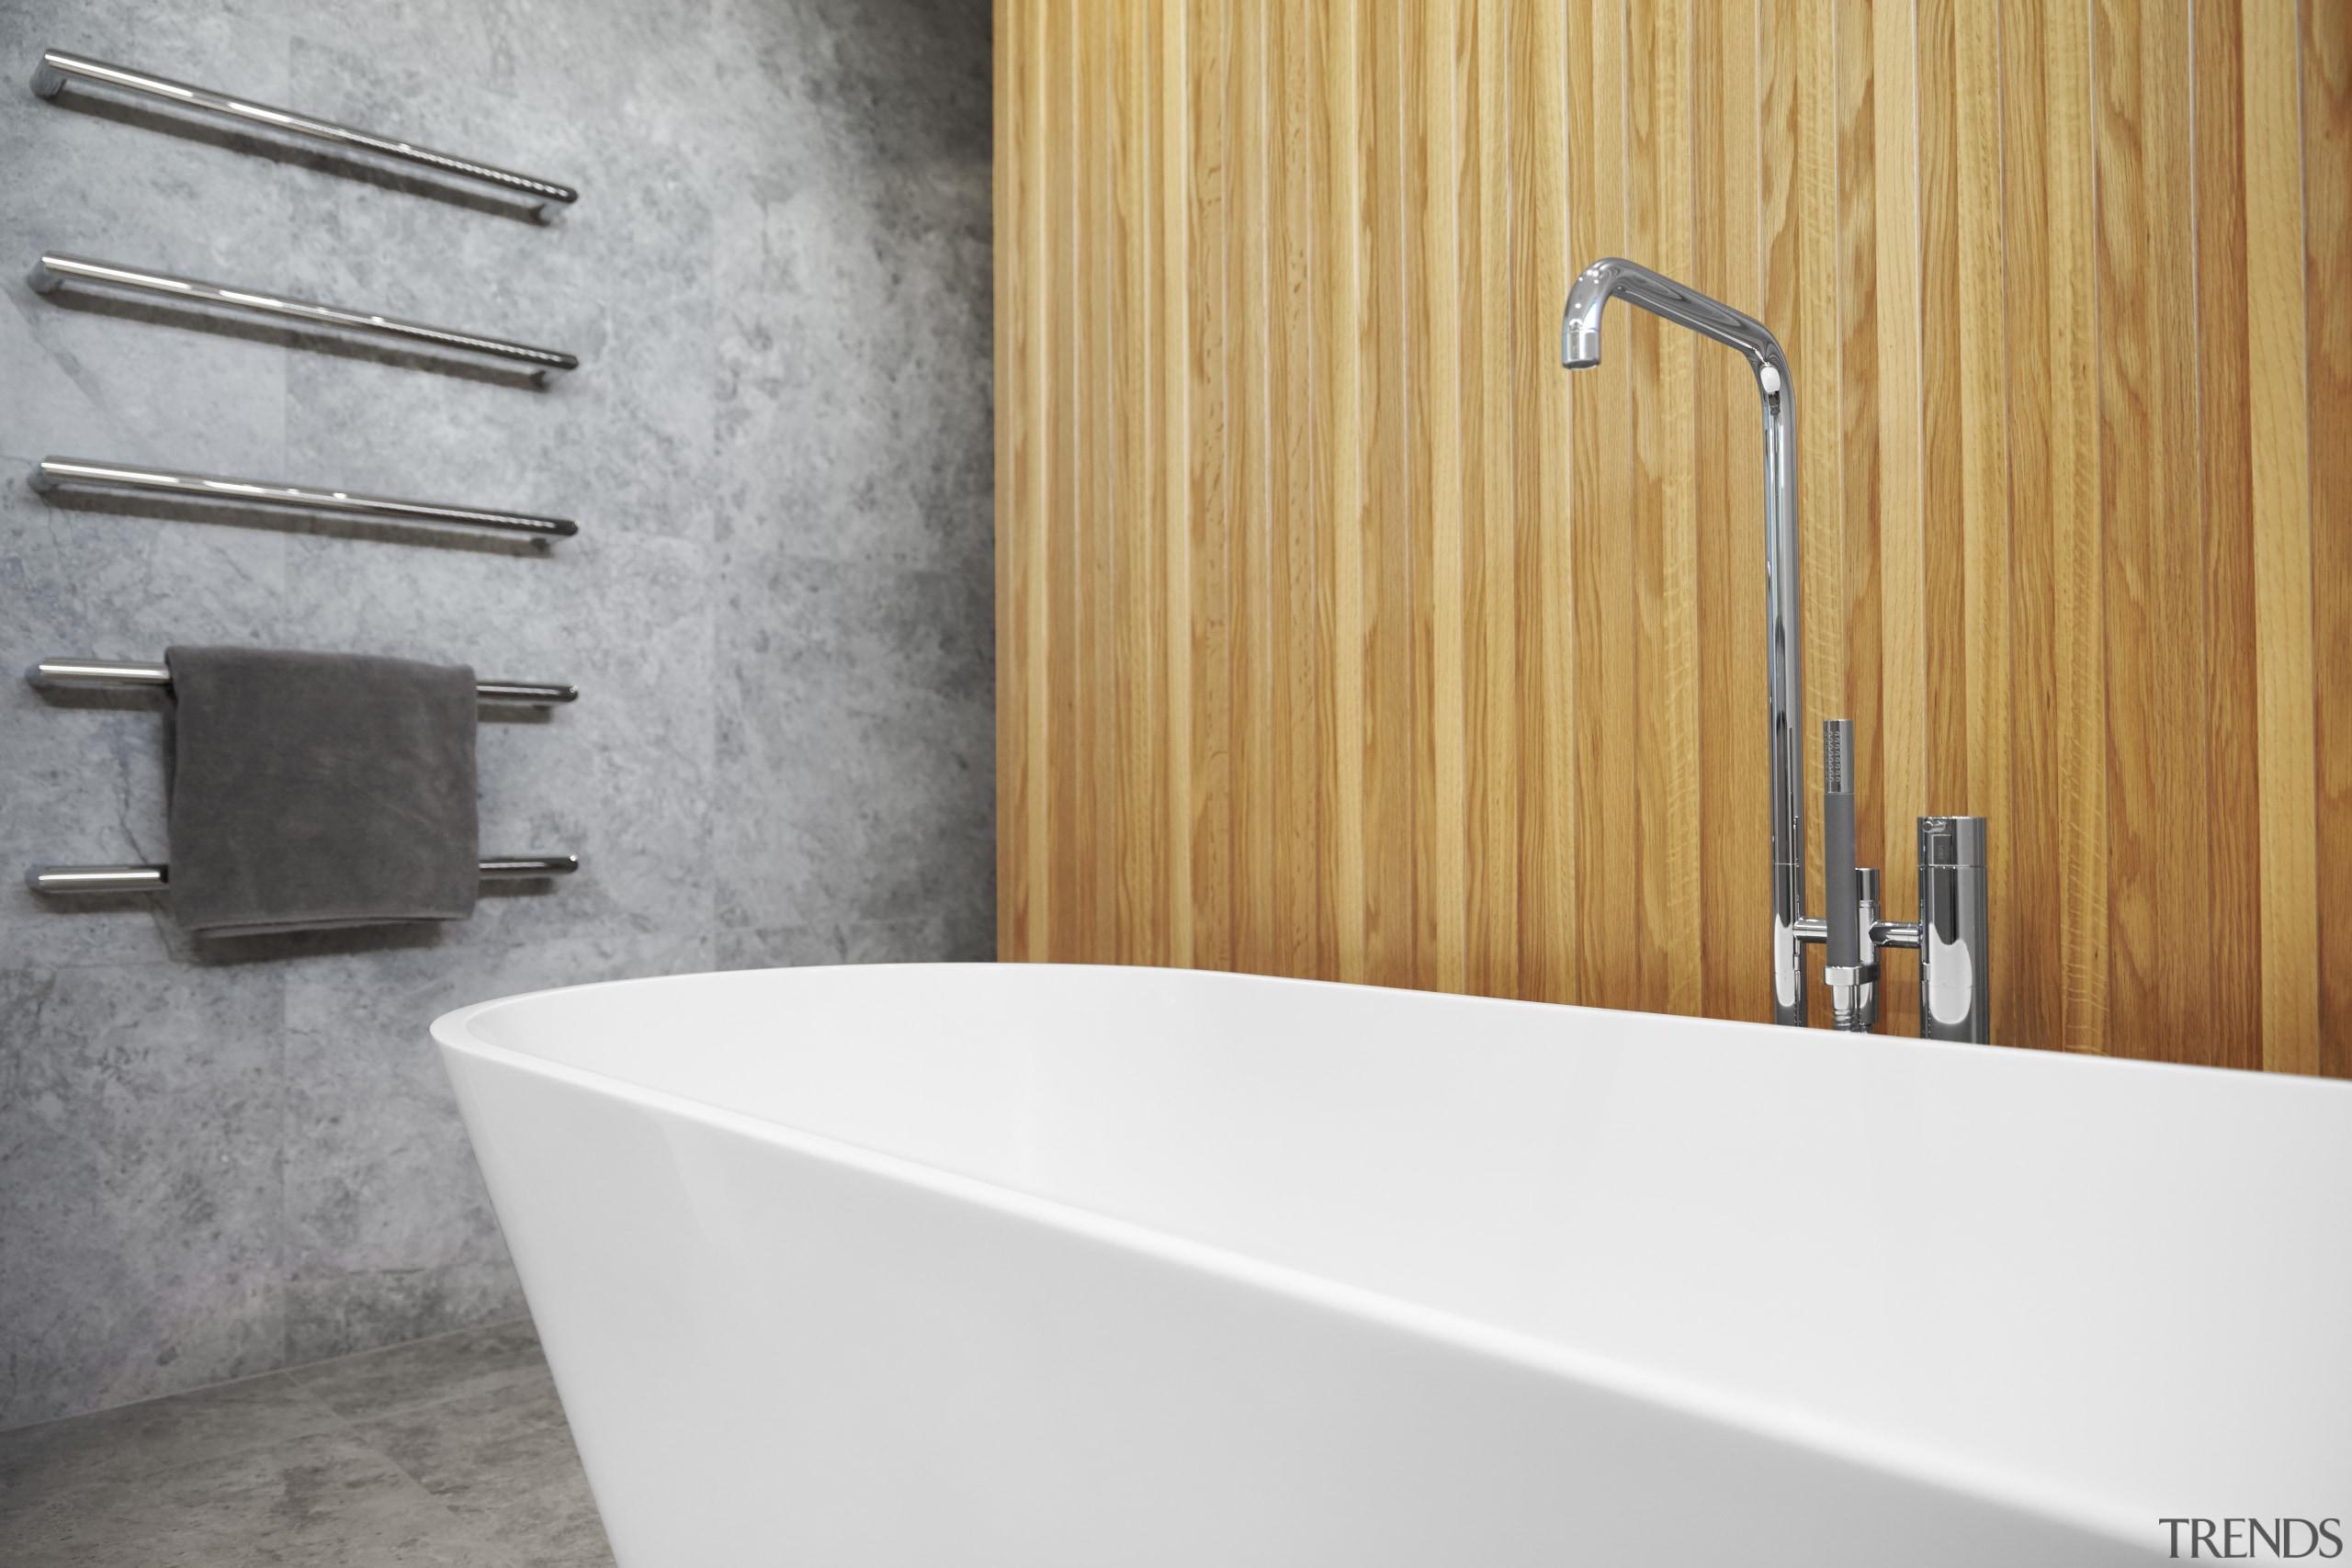 The sculptural bath tub is set off by bathroom, bathroom sink, plumbing fixture, sink, tap, tile, wall, white, gray, orange